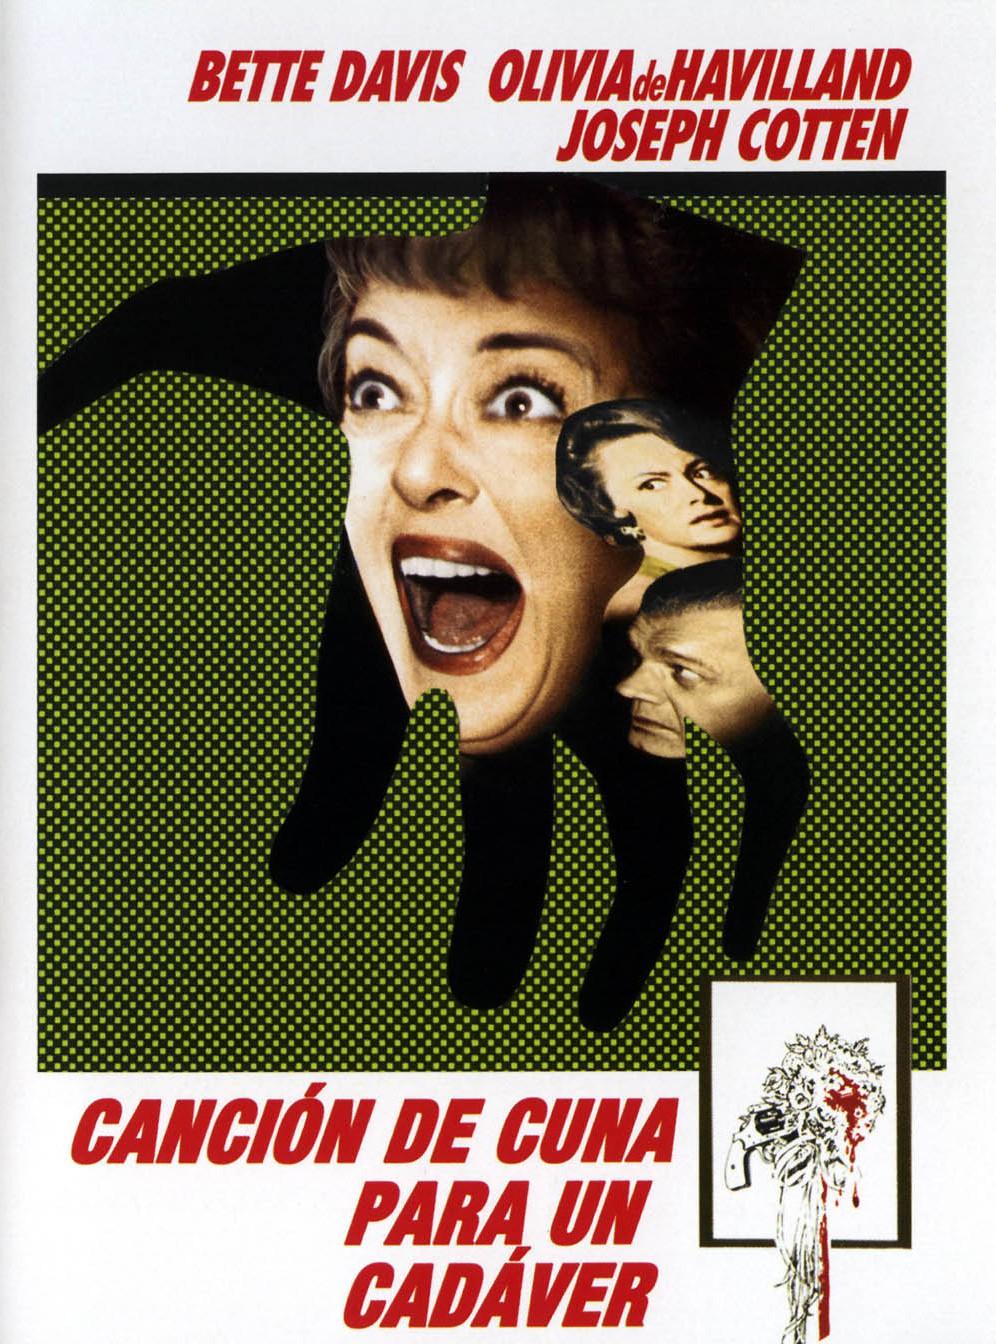 Compras cinéfilas - Página 3 Poster-cancion-de-cuna-para-un-cadaver-e1406398166208